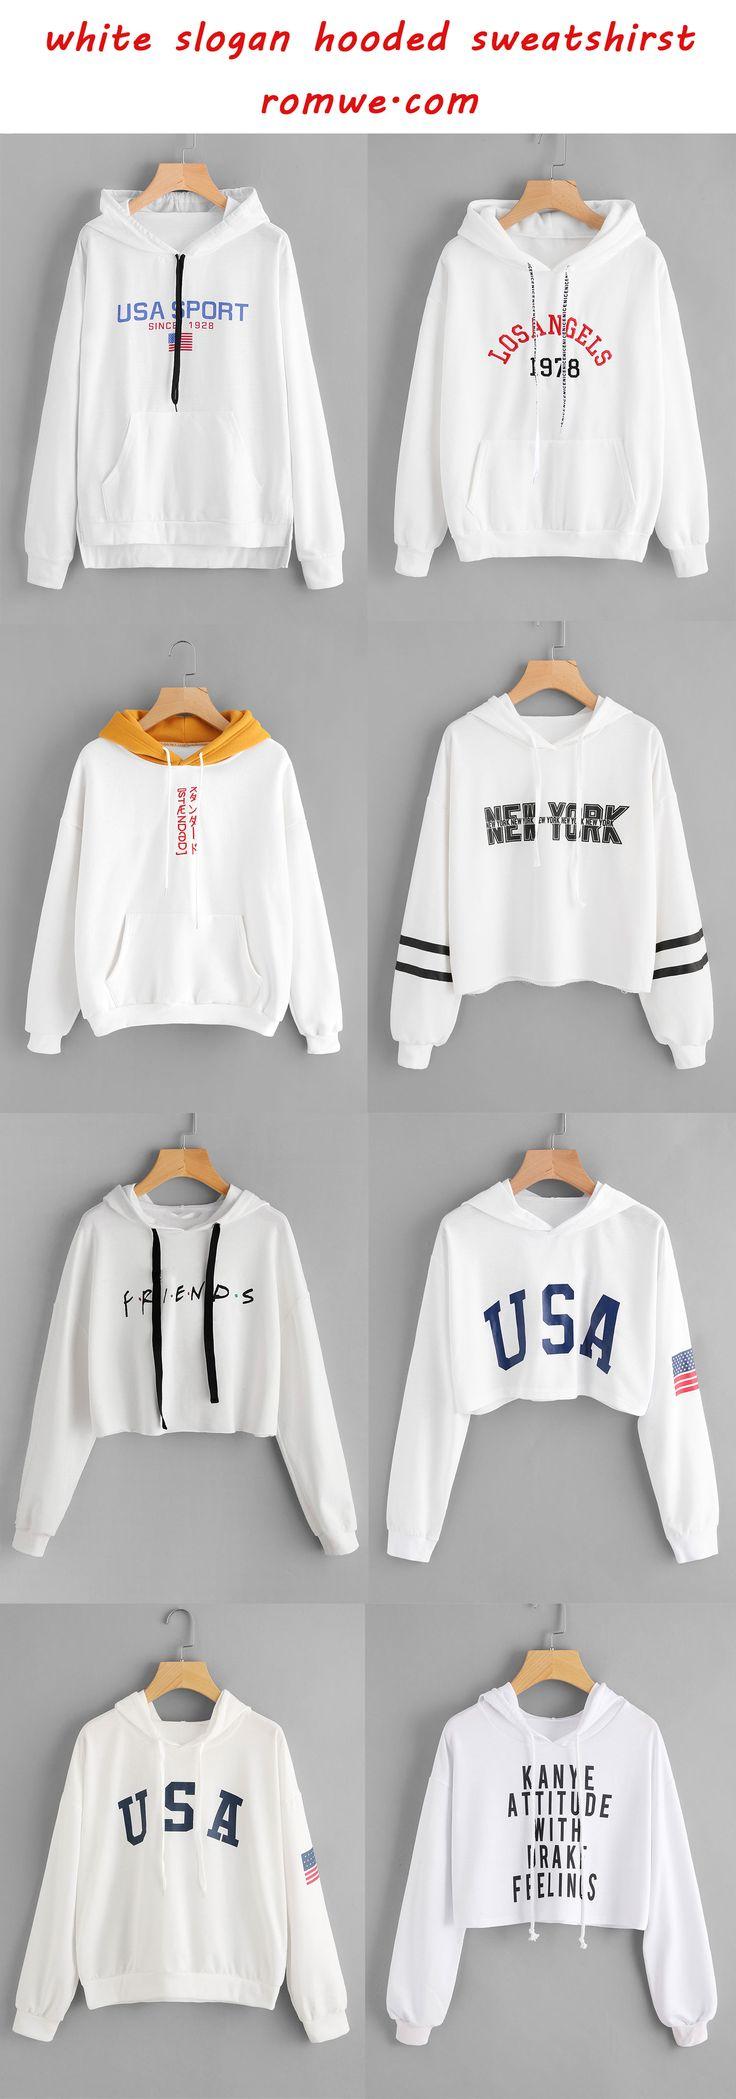 white slogan hooded sweatshirts - romwe.com